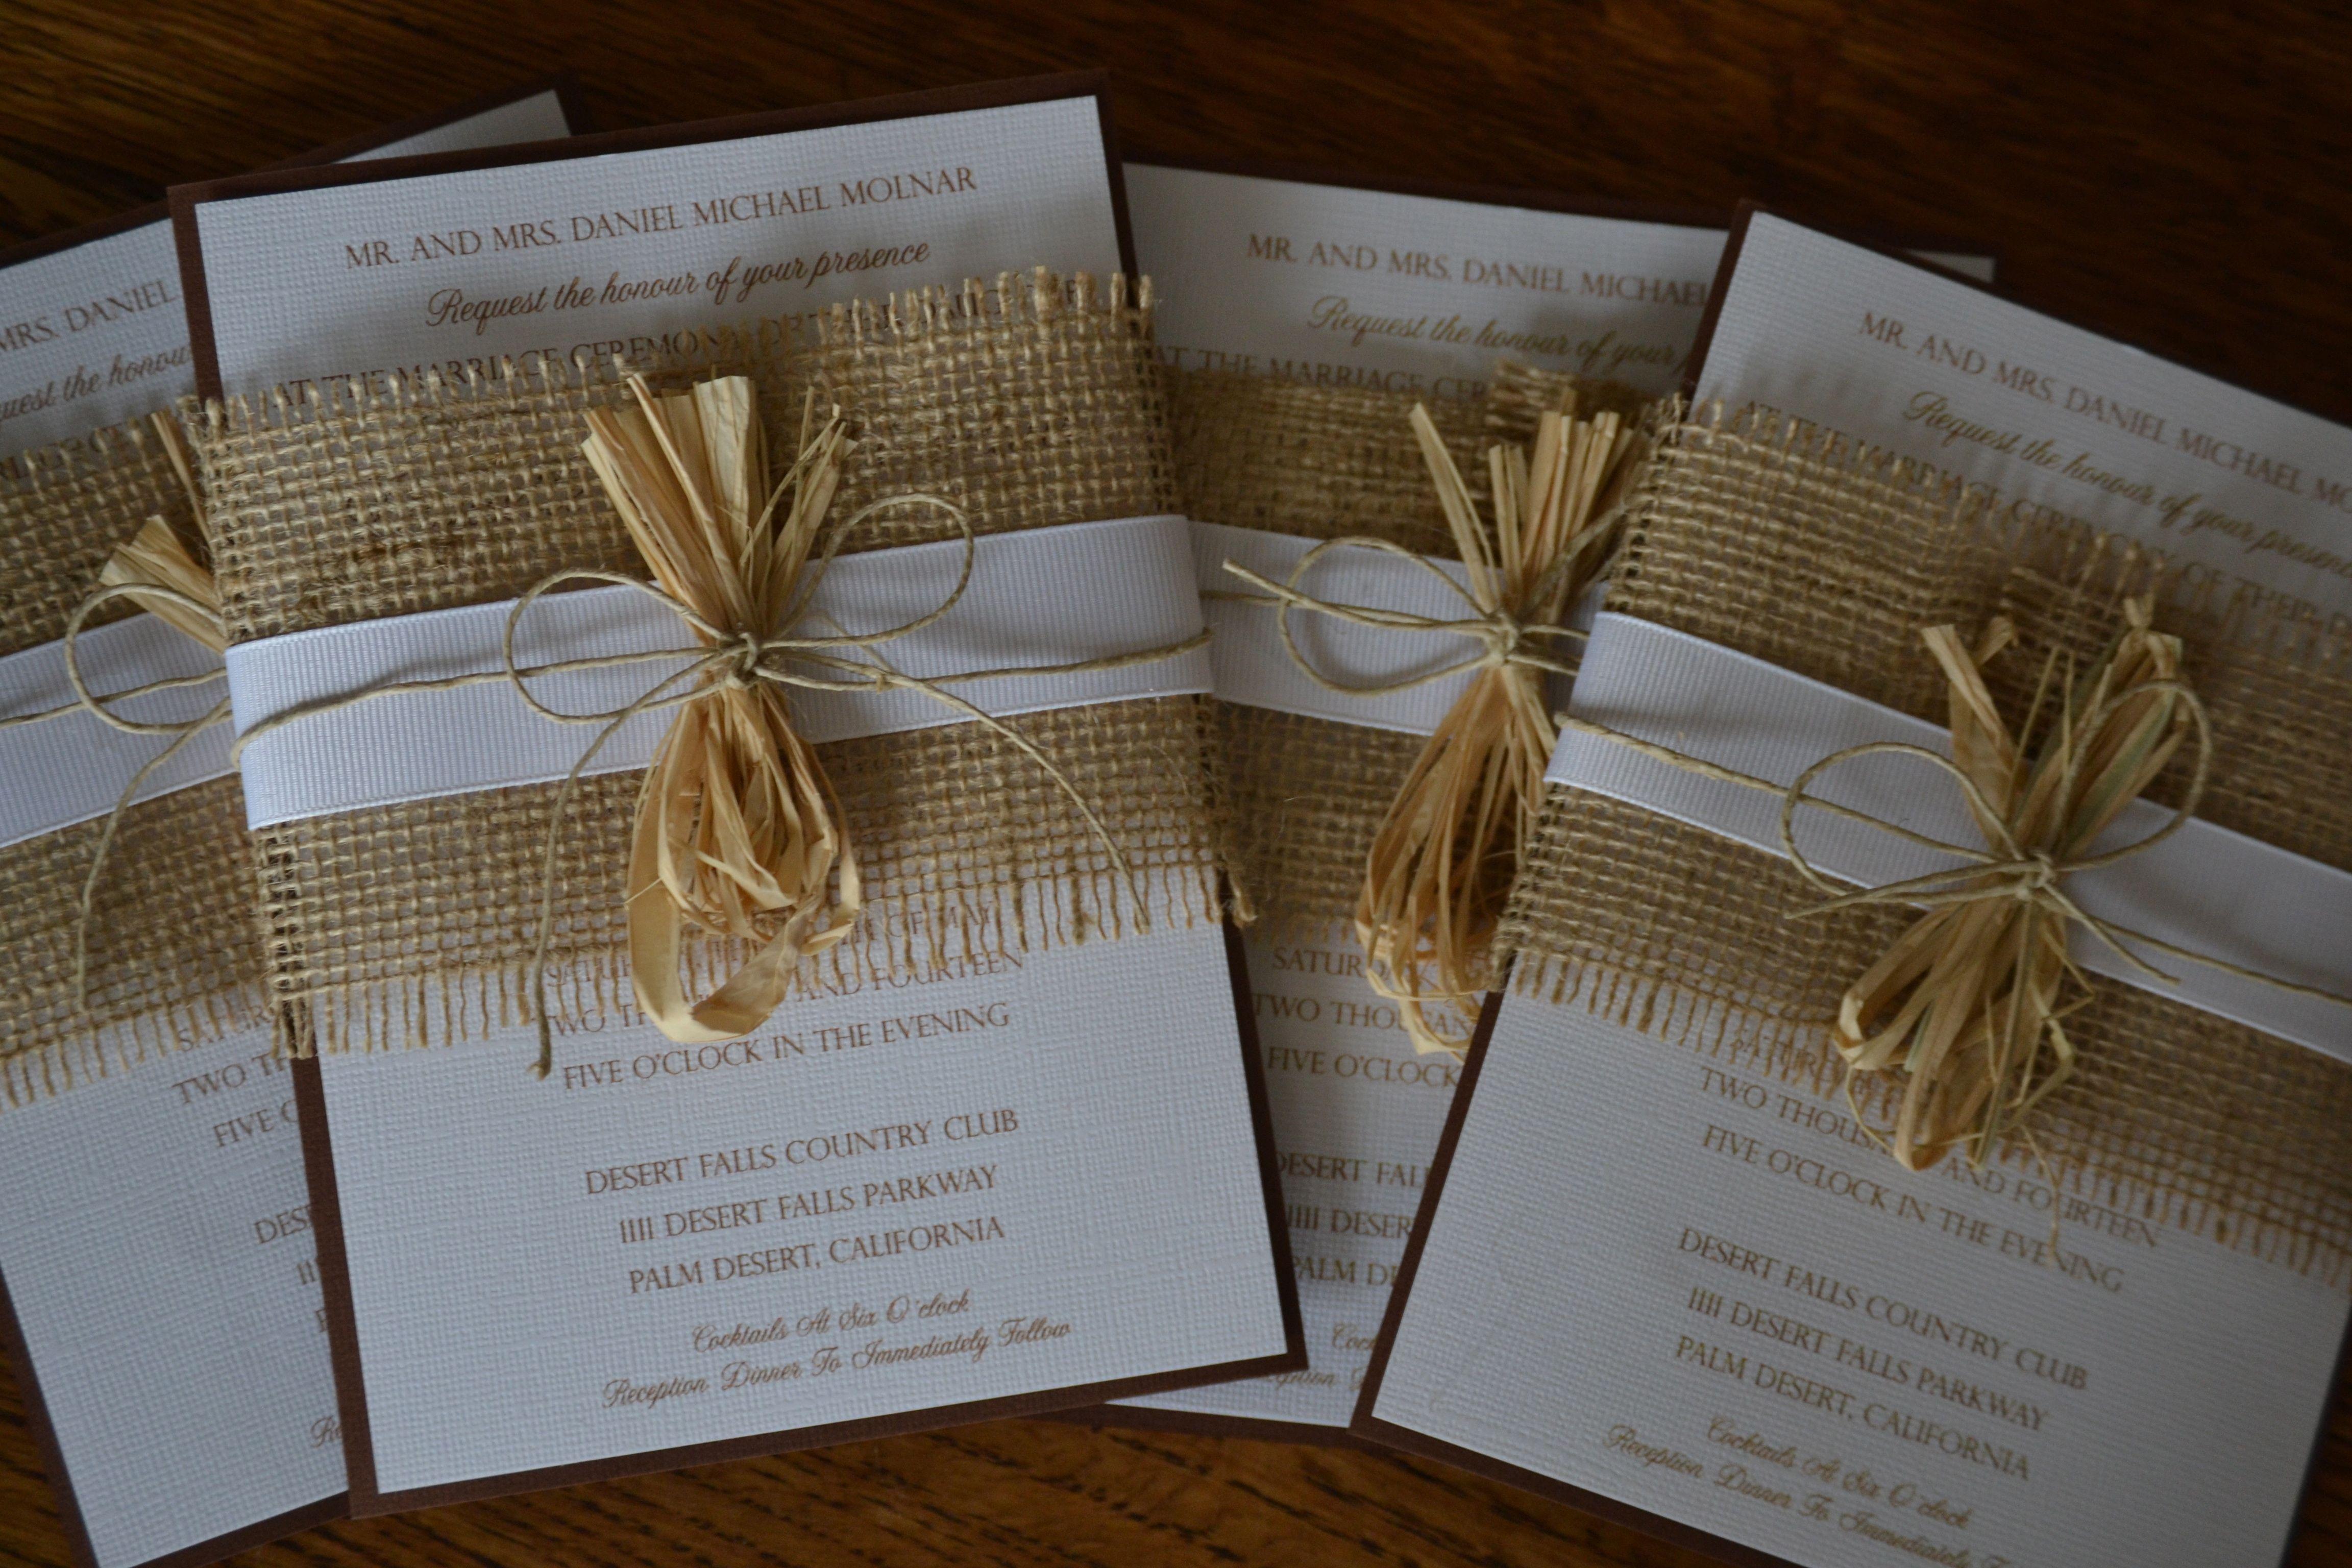 Diy Wedding Invitations Burlap Ribbon Twine Rustic Chic: Wedding Invitations With Burlap At Websimilar.org